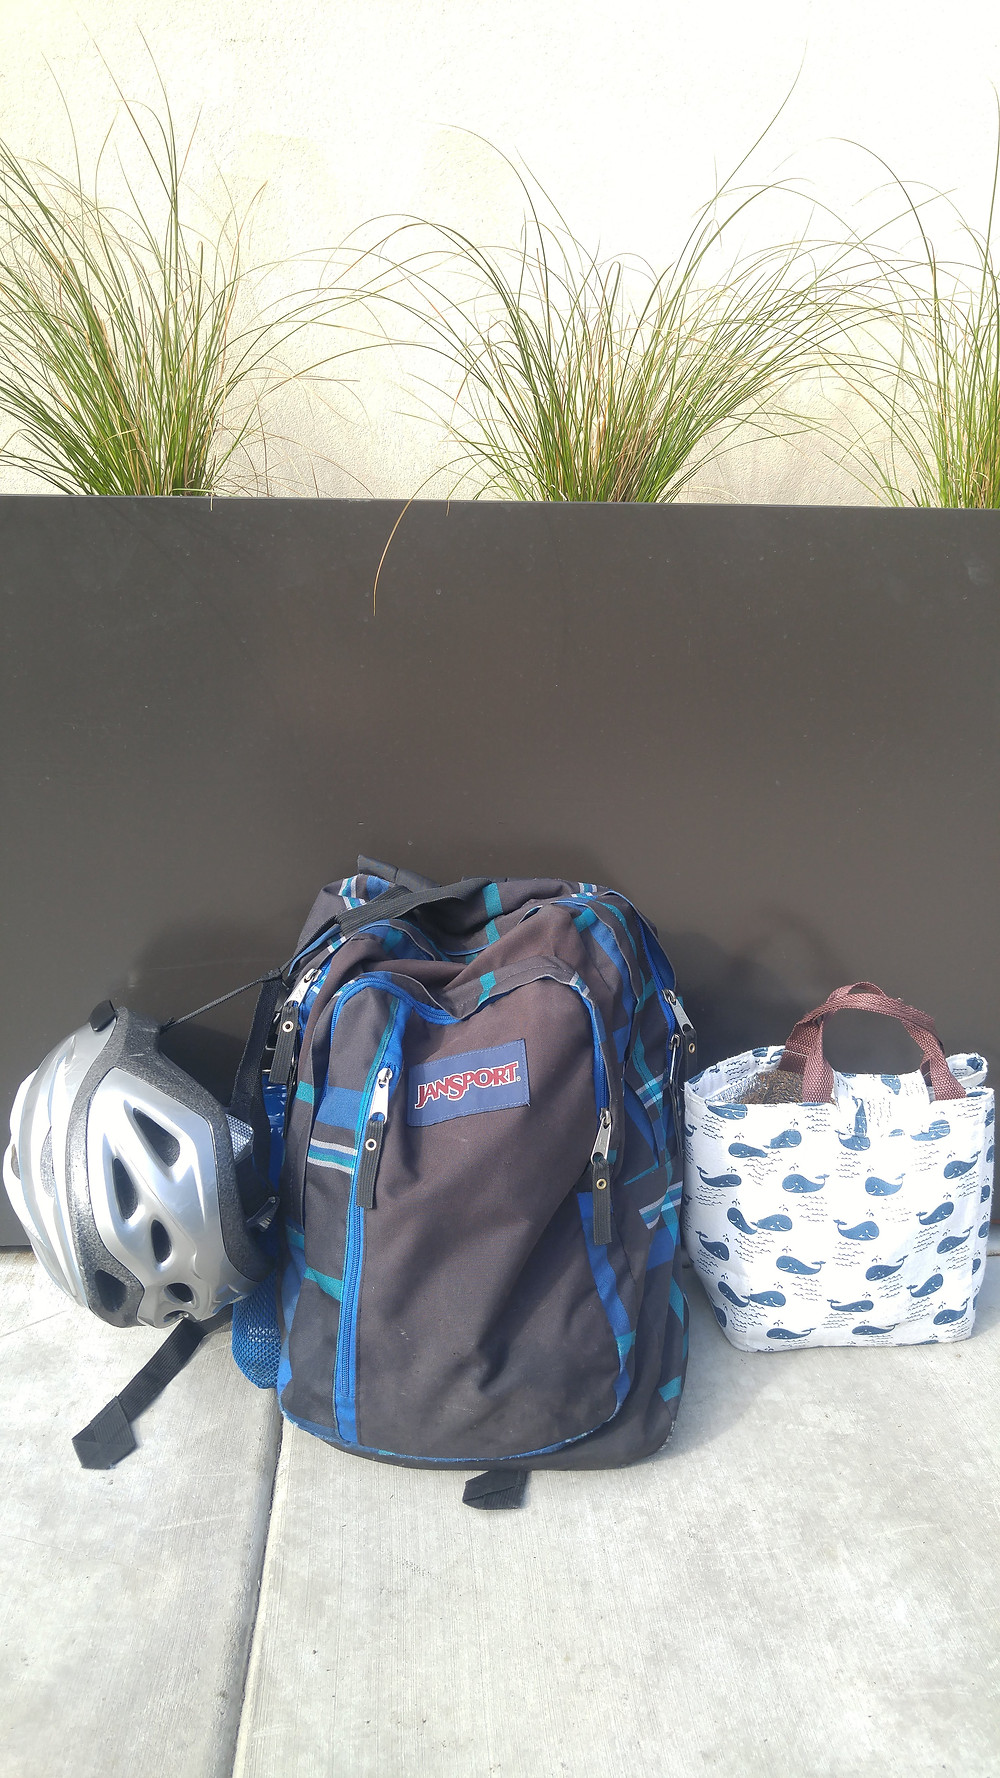 Backpack with bike helmet